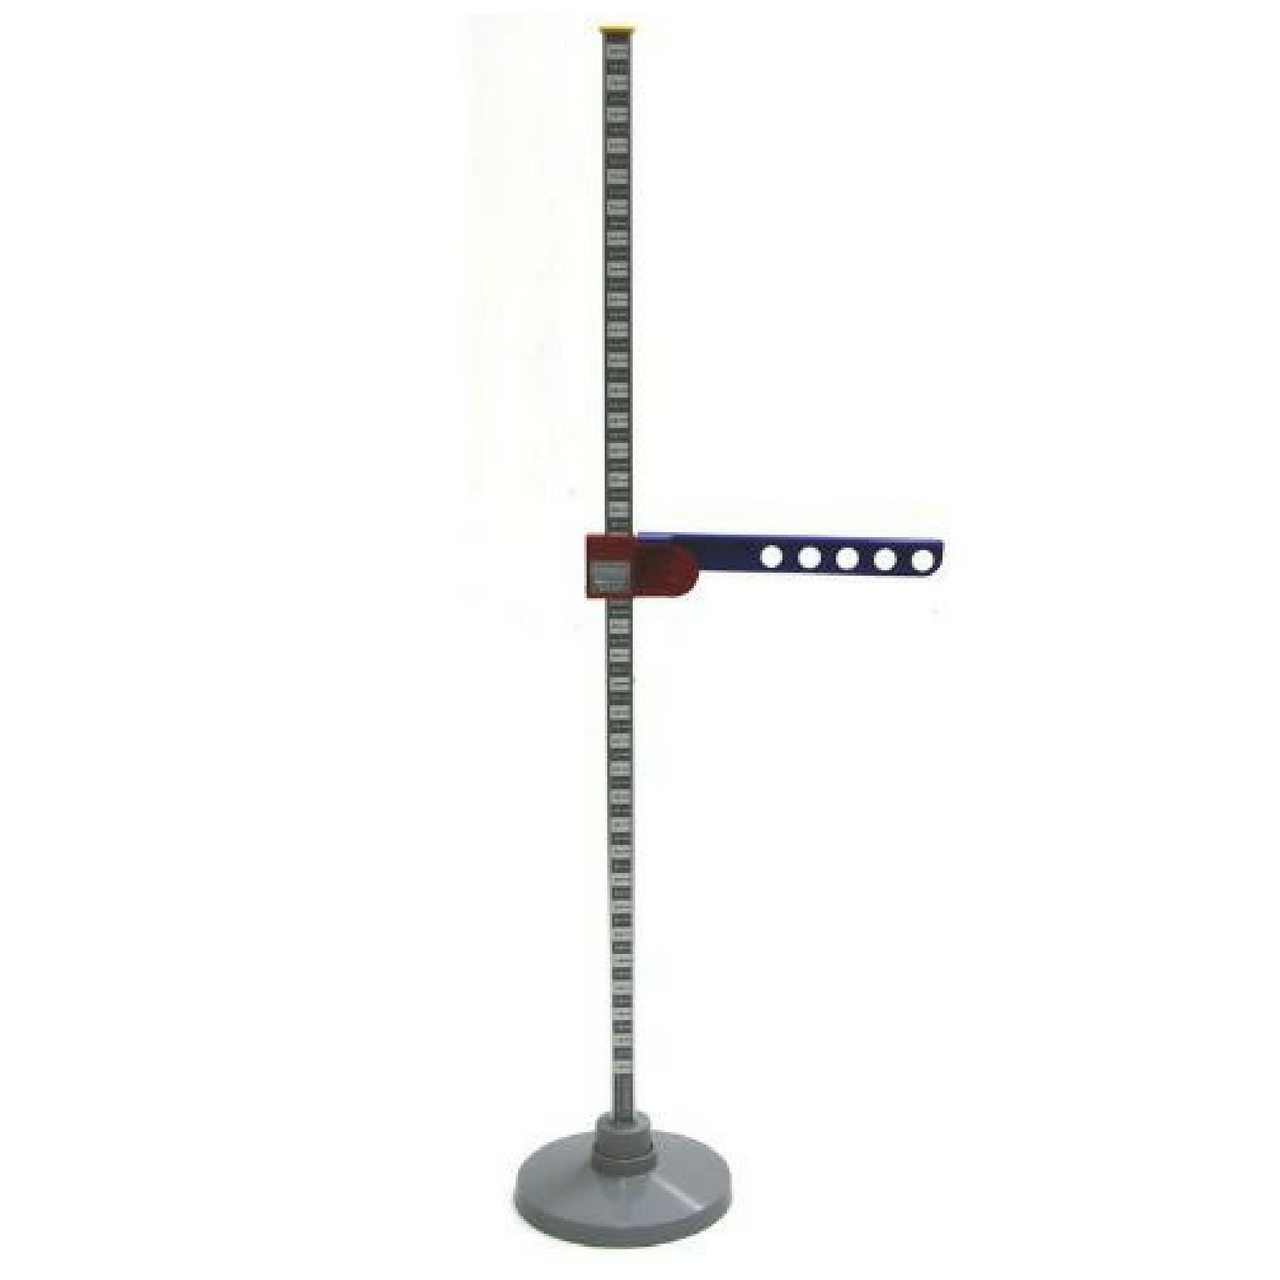 Takei 5004 Trunk Extension Meter